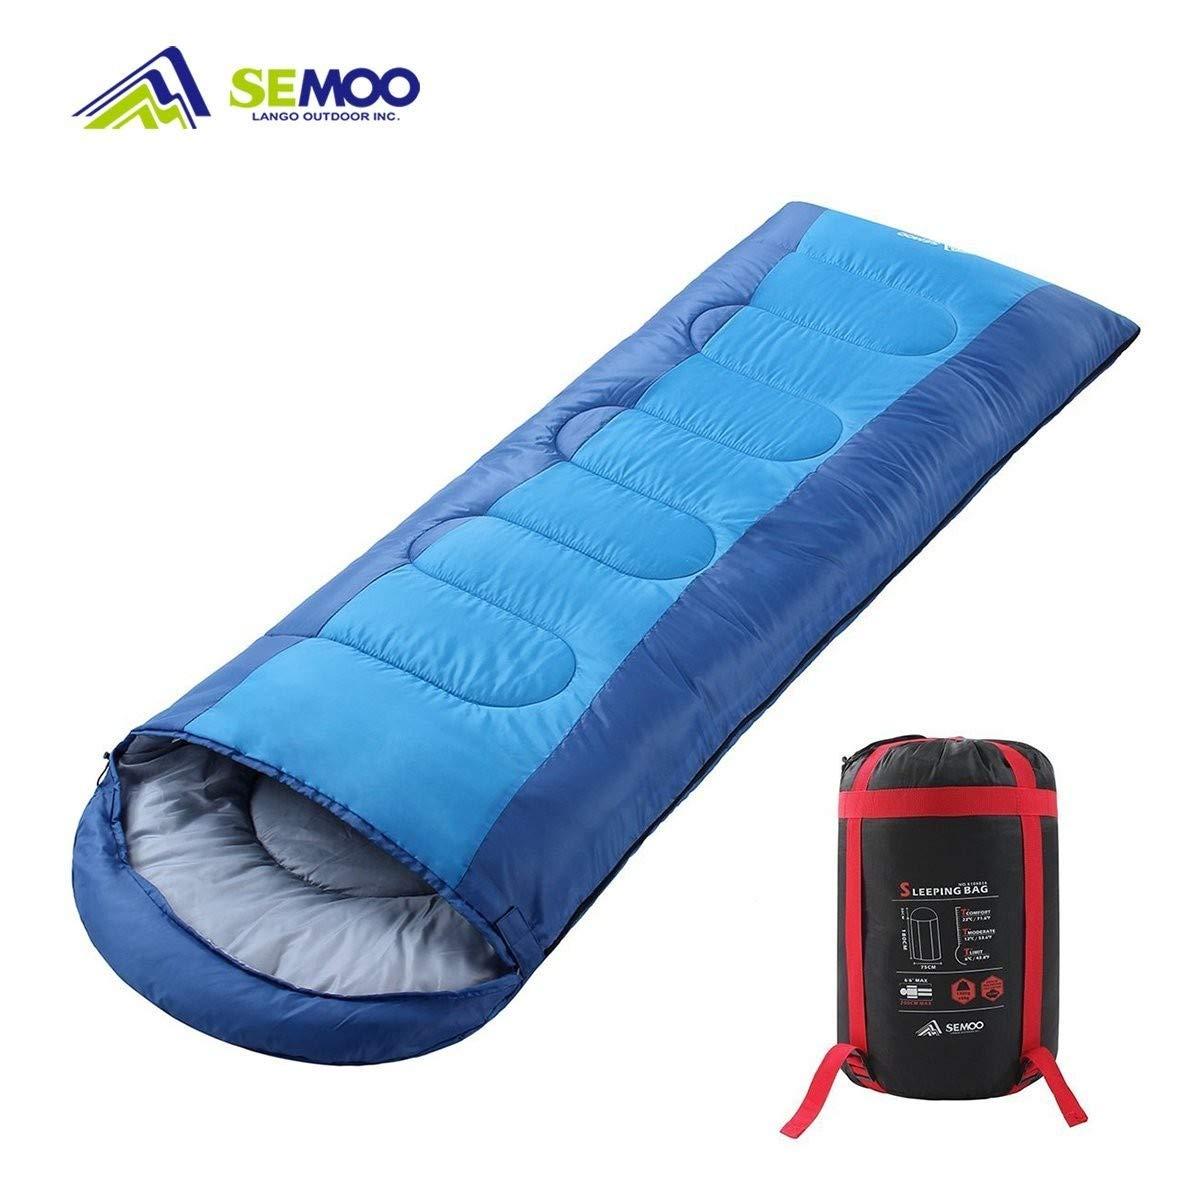 Semoo Saco de Dormir Impermeable, de 10-22ºC, 190T, Encapuchado para Adultos, con Bolsa de Compresión product image